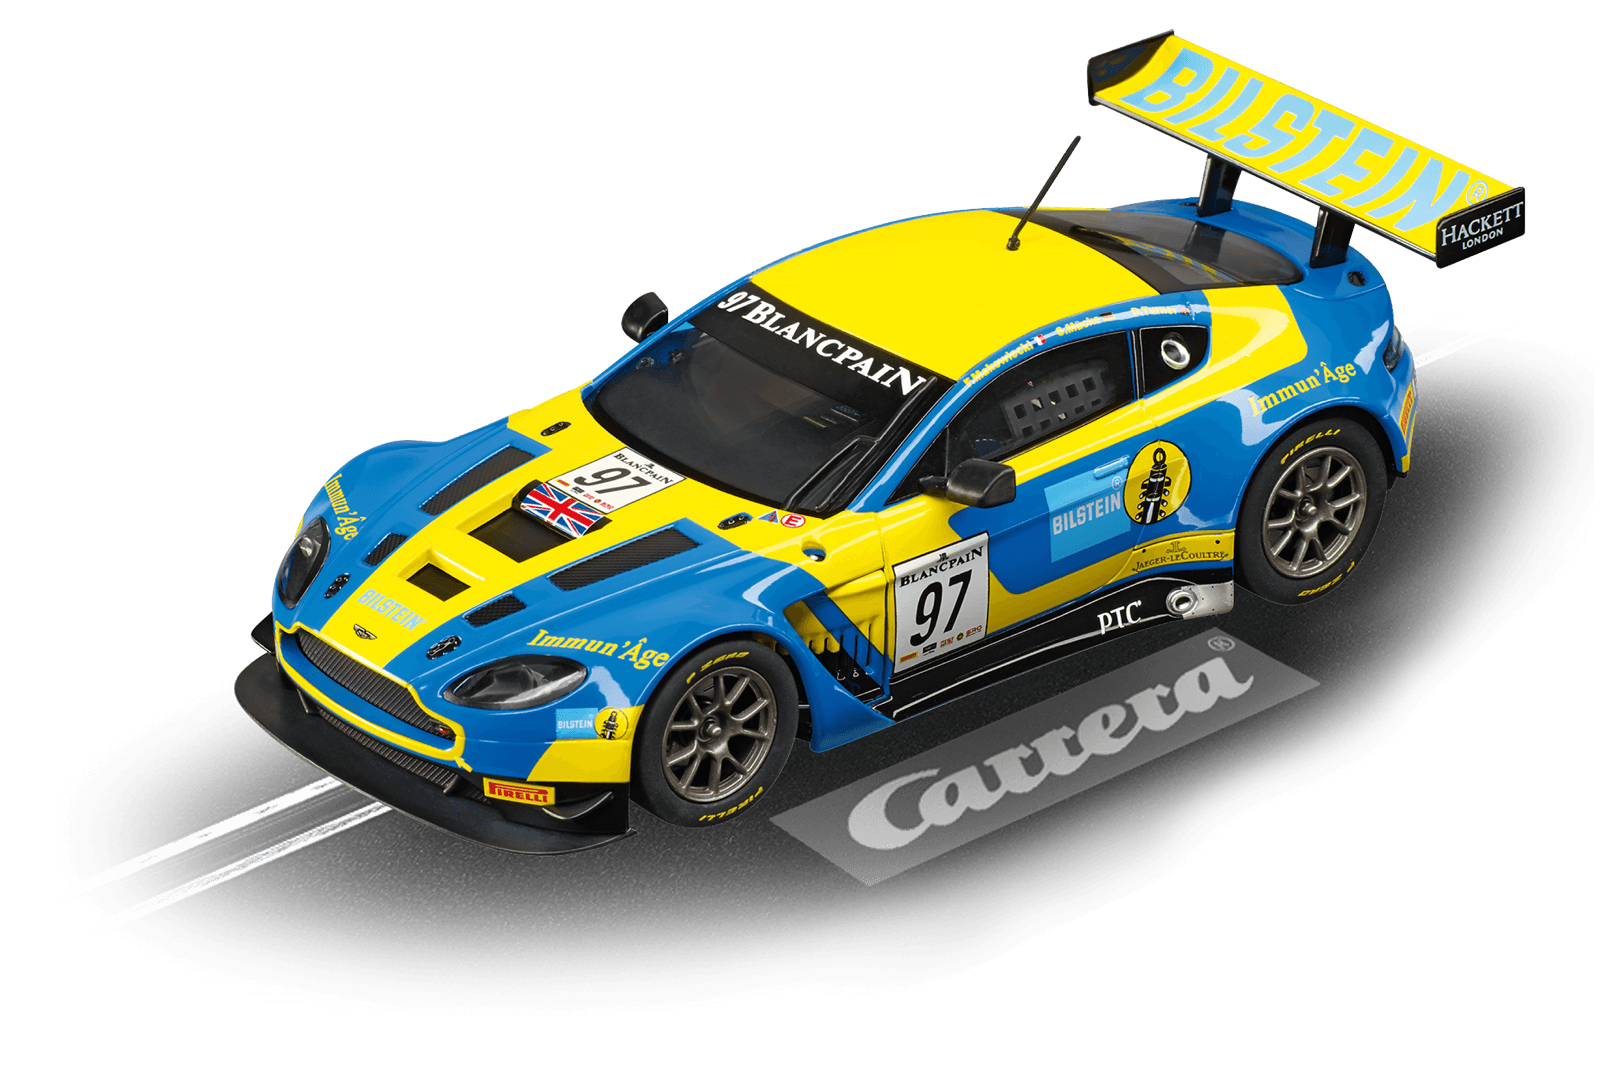 TOP Tuning Carrera Digital 132 - Aston Martin V12 Vantage  Bilstein  wie 30676